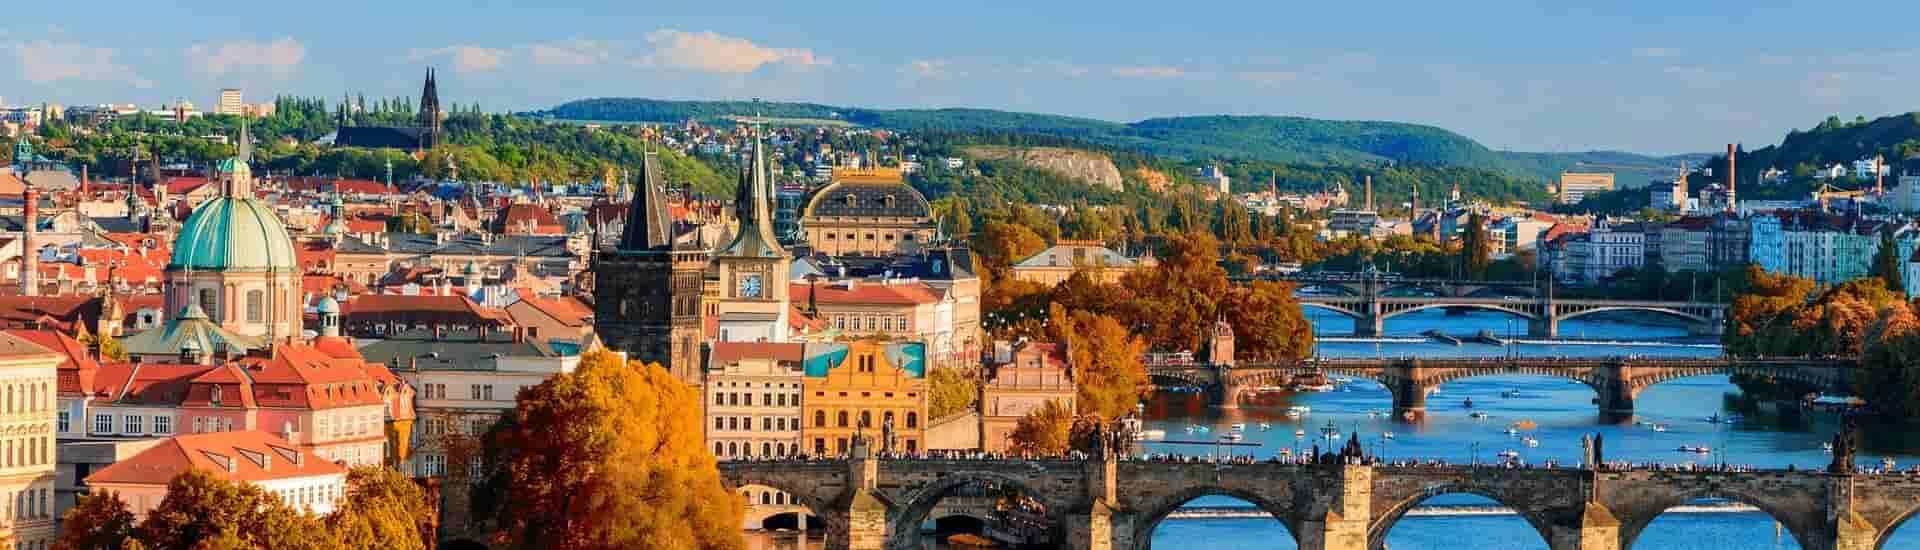 City Tour en Praga